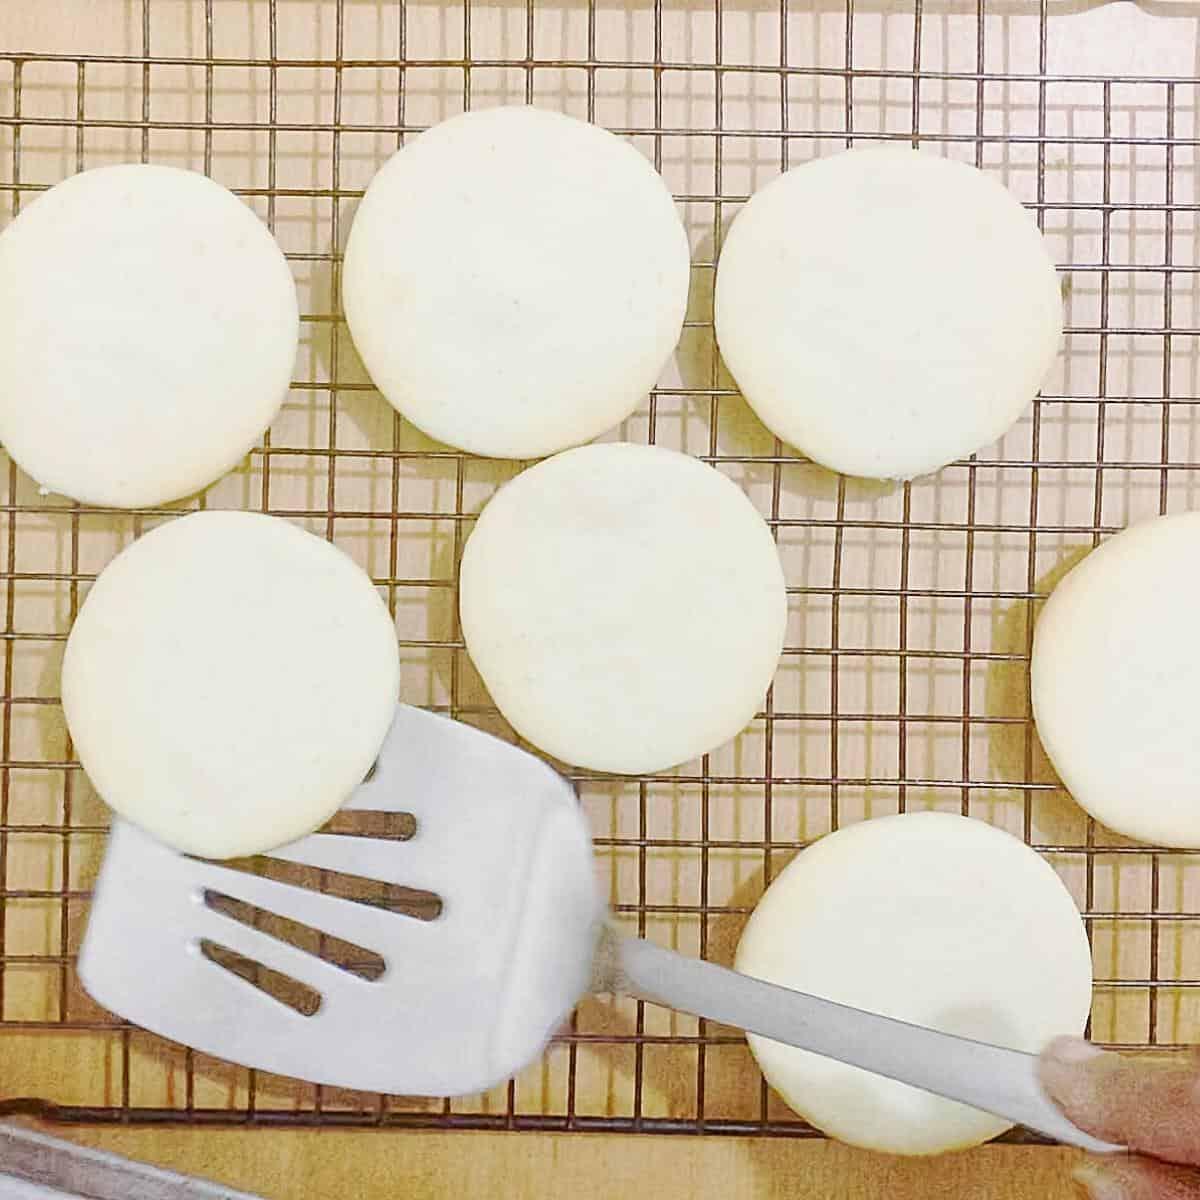 sugar cookies on a cooling rack.